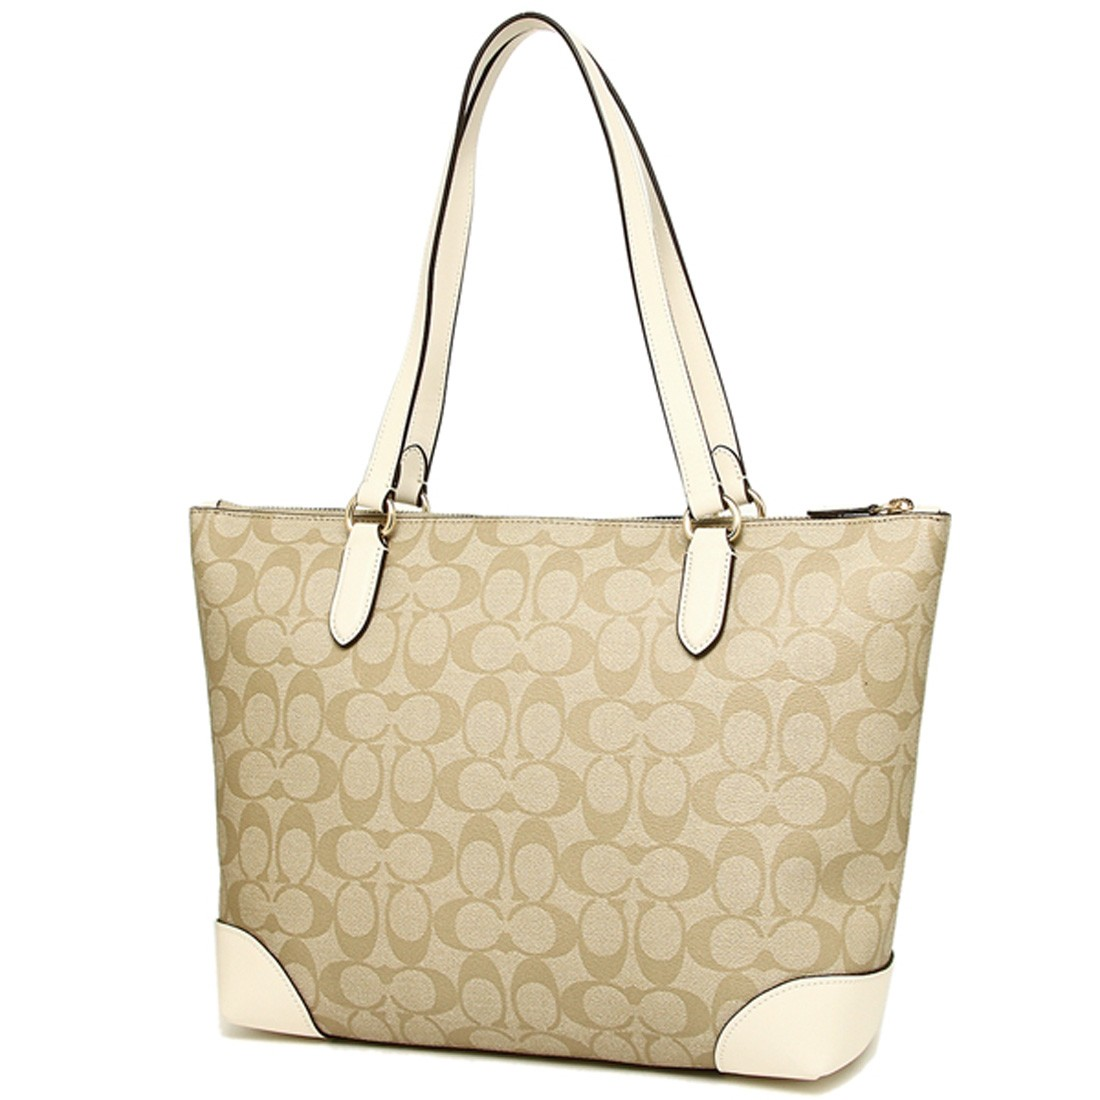 edf5c8bb Details about NWT COACH Zip Top Shoulder Signature Leather Handbag Purse  Tote Bag Brown White